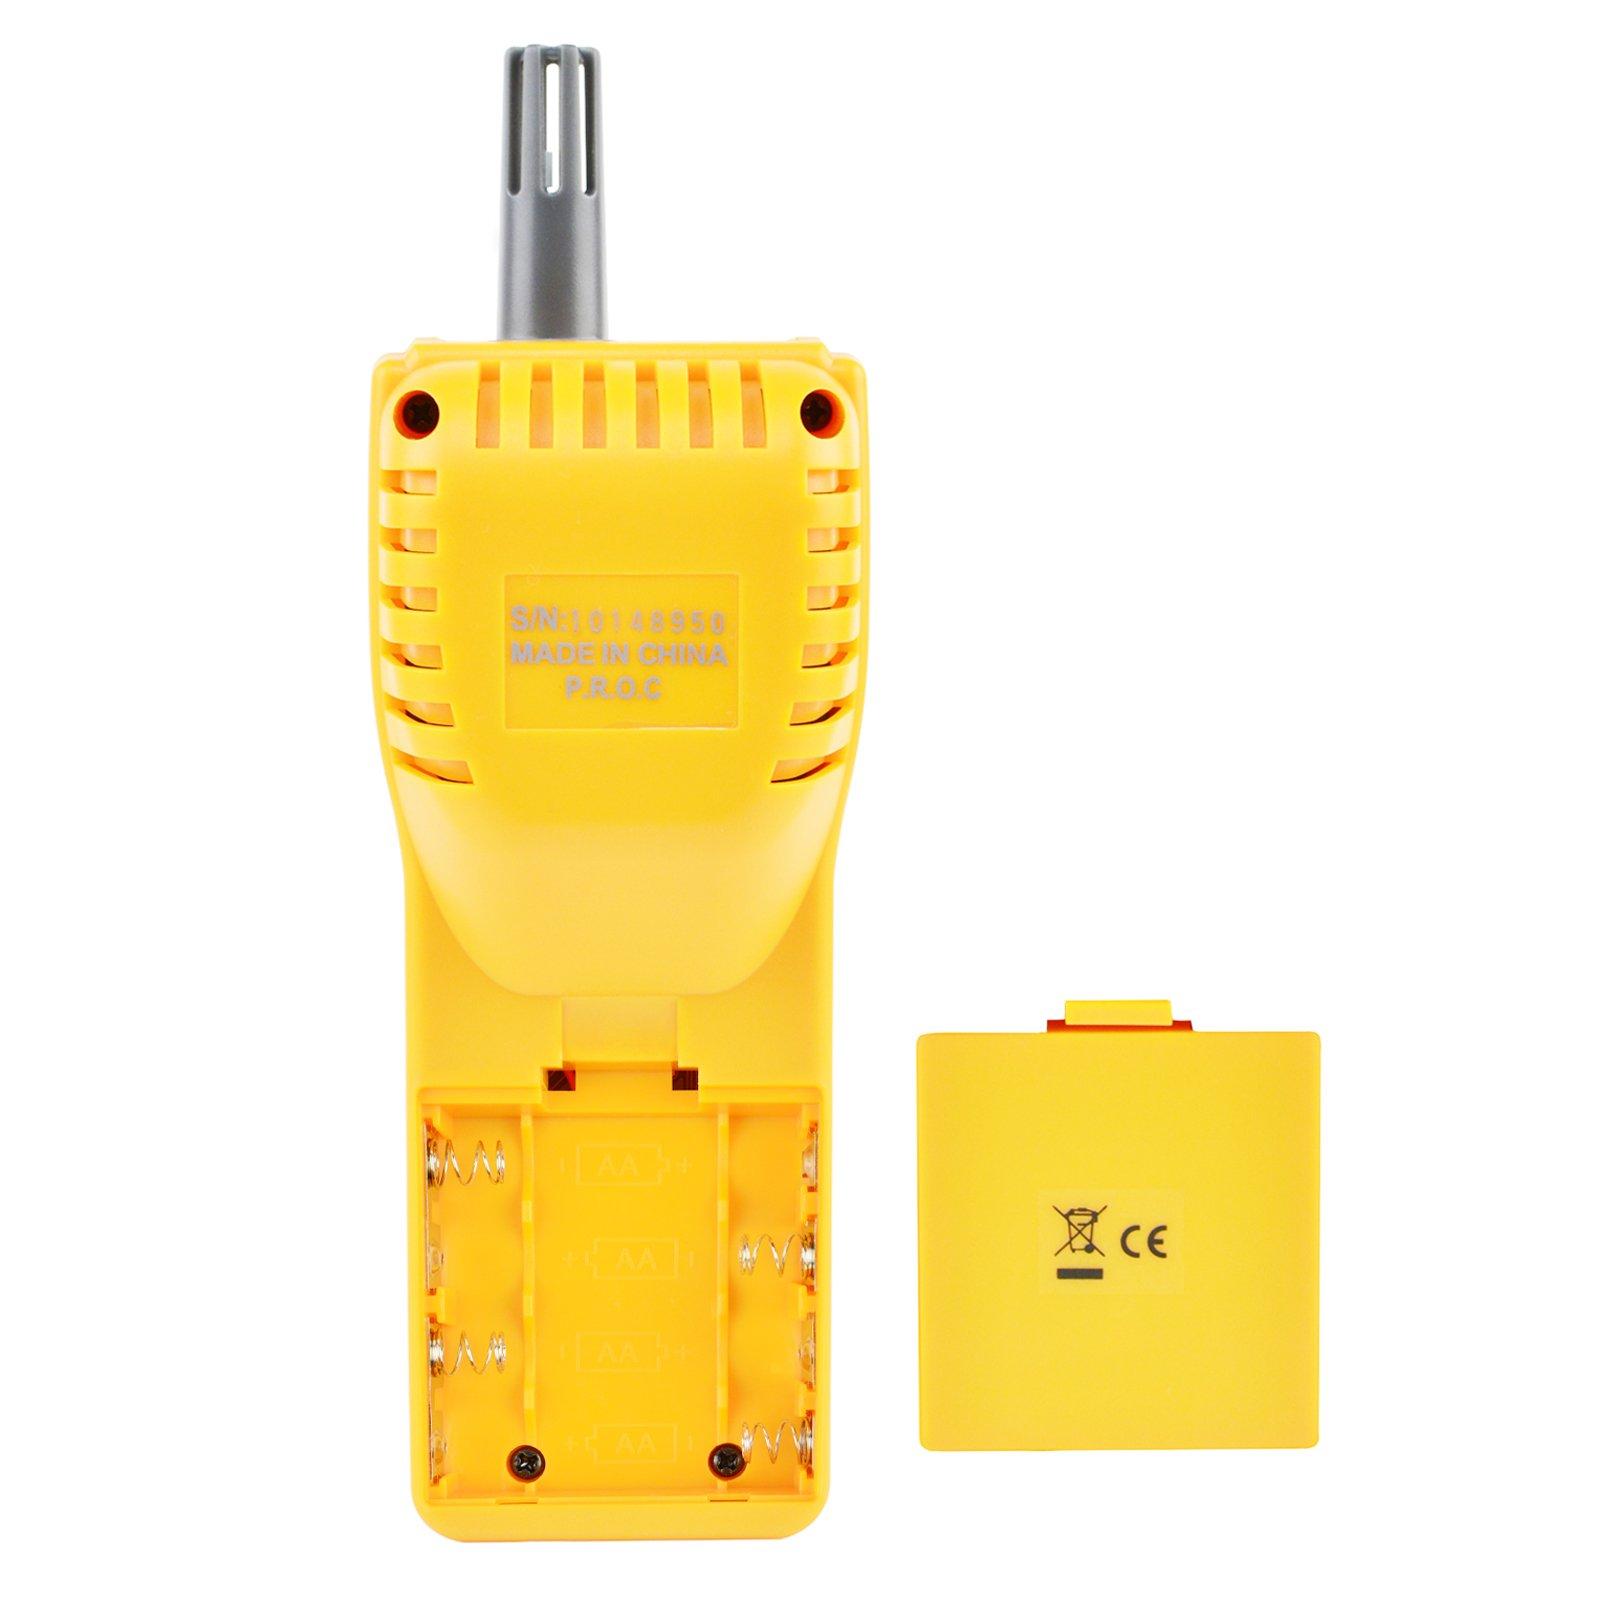 Portable Digital Carbon Dioxide Temperature Humidity Indoor 9999ppm NDIR  Sensor IAQ CO2 Monitor Wet Bulb Temperature (WB) Dew Point (DP) Tester CO2